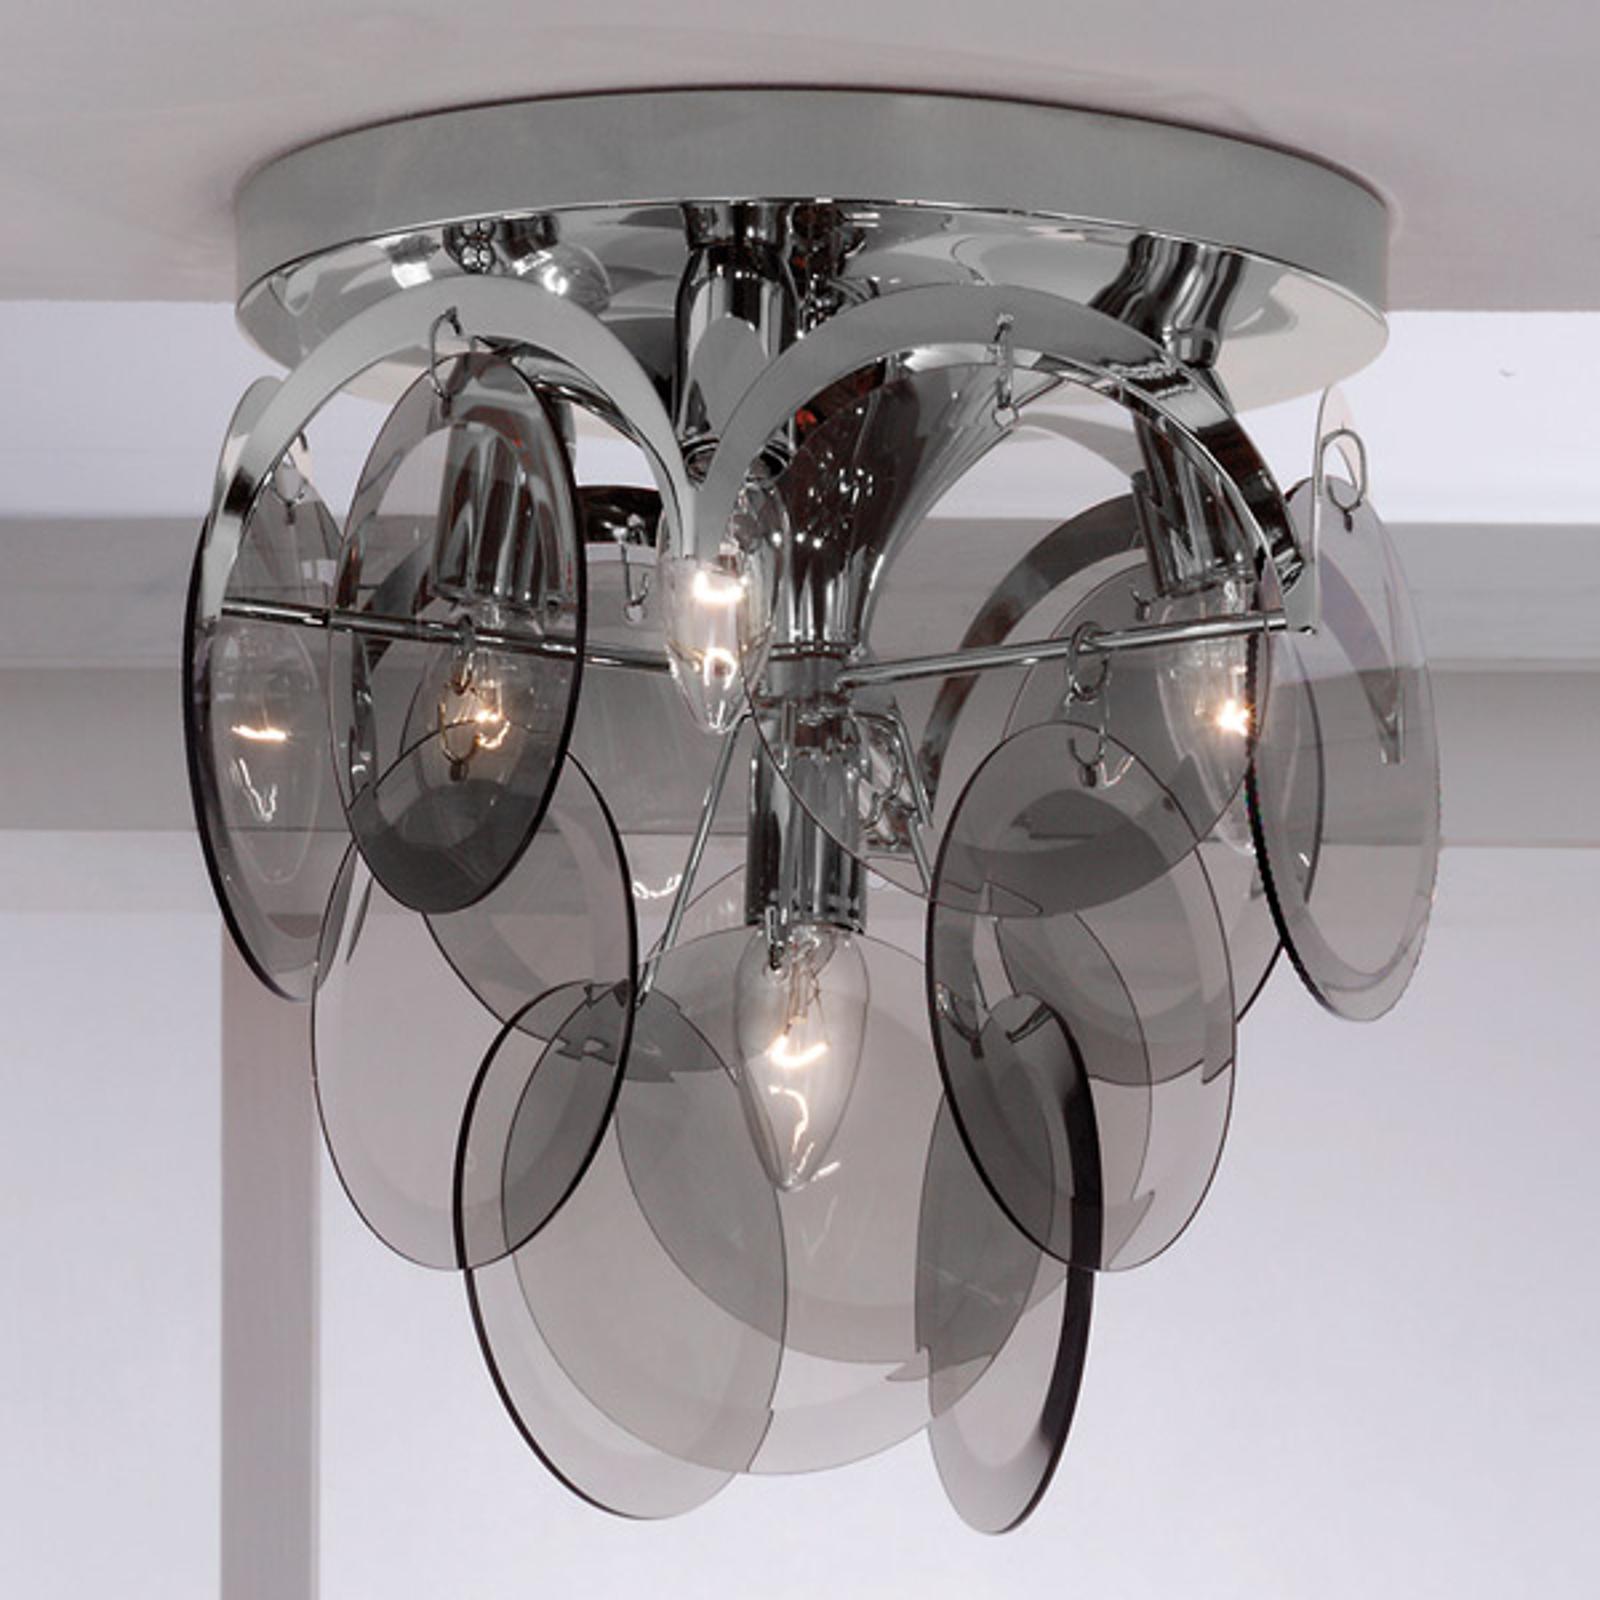 Pyntende røgglas - loftslampen Carolo, 4 lysk.